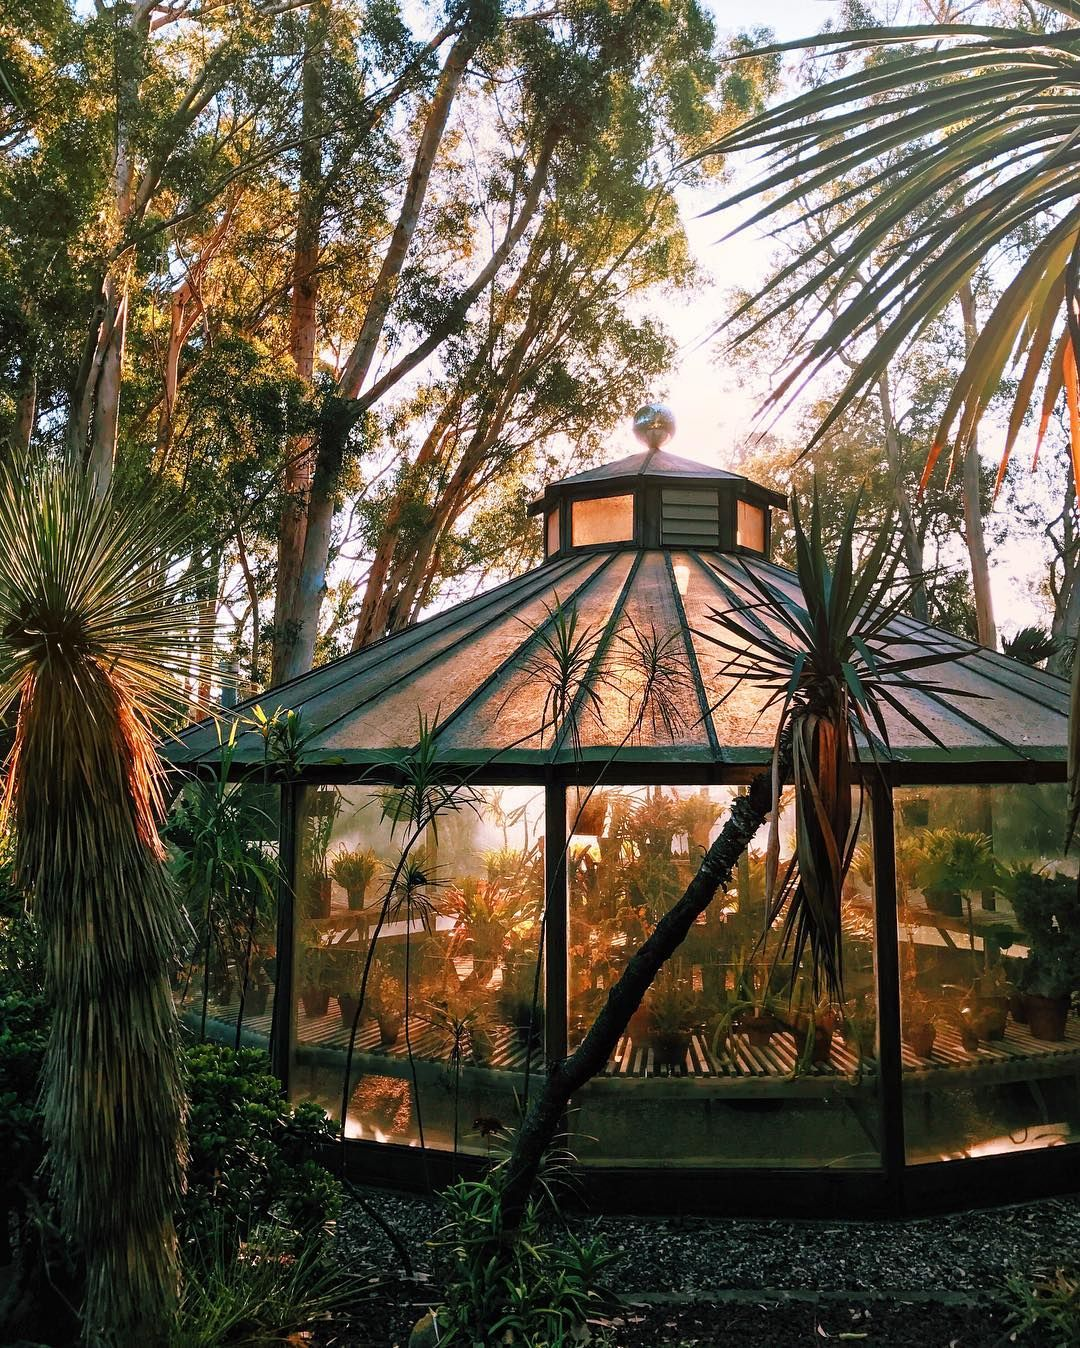 Ganna walska lotusland | Lotusland | Pinterest